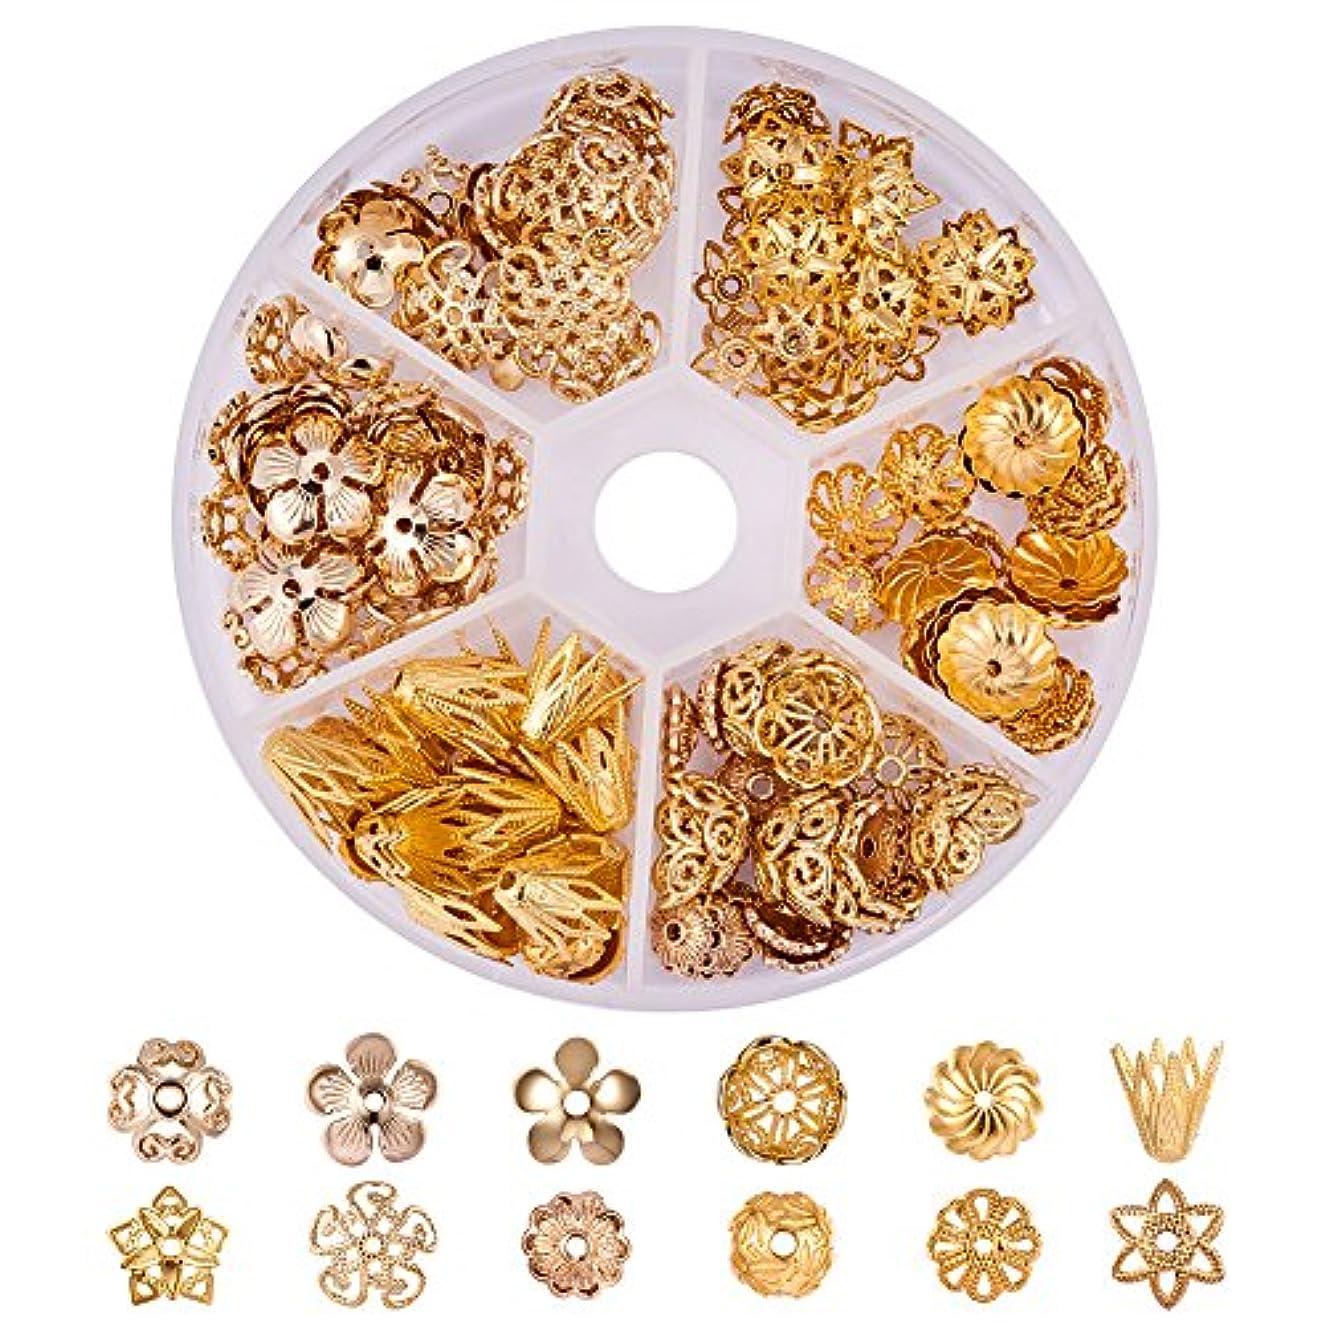 PandaHall Elite About 144 Pcs Brass Flower Bead Caps 12 Styles Jewelry Making Golden